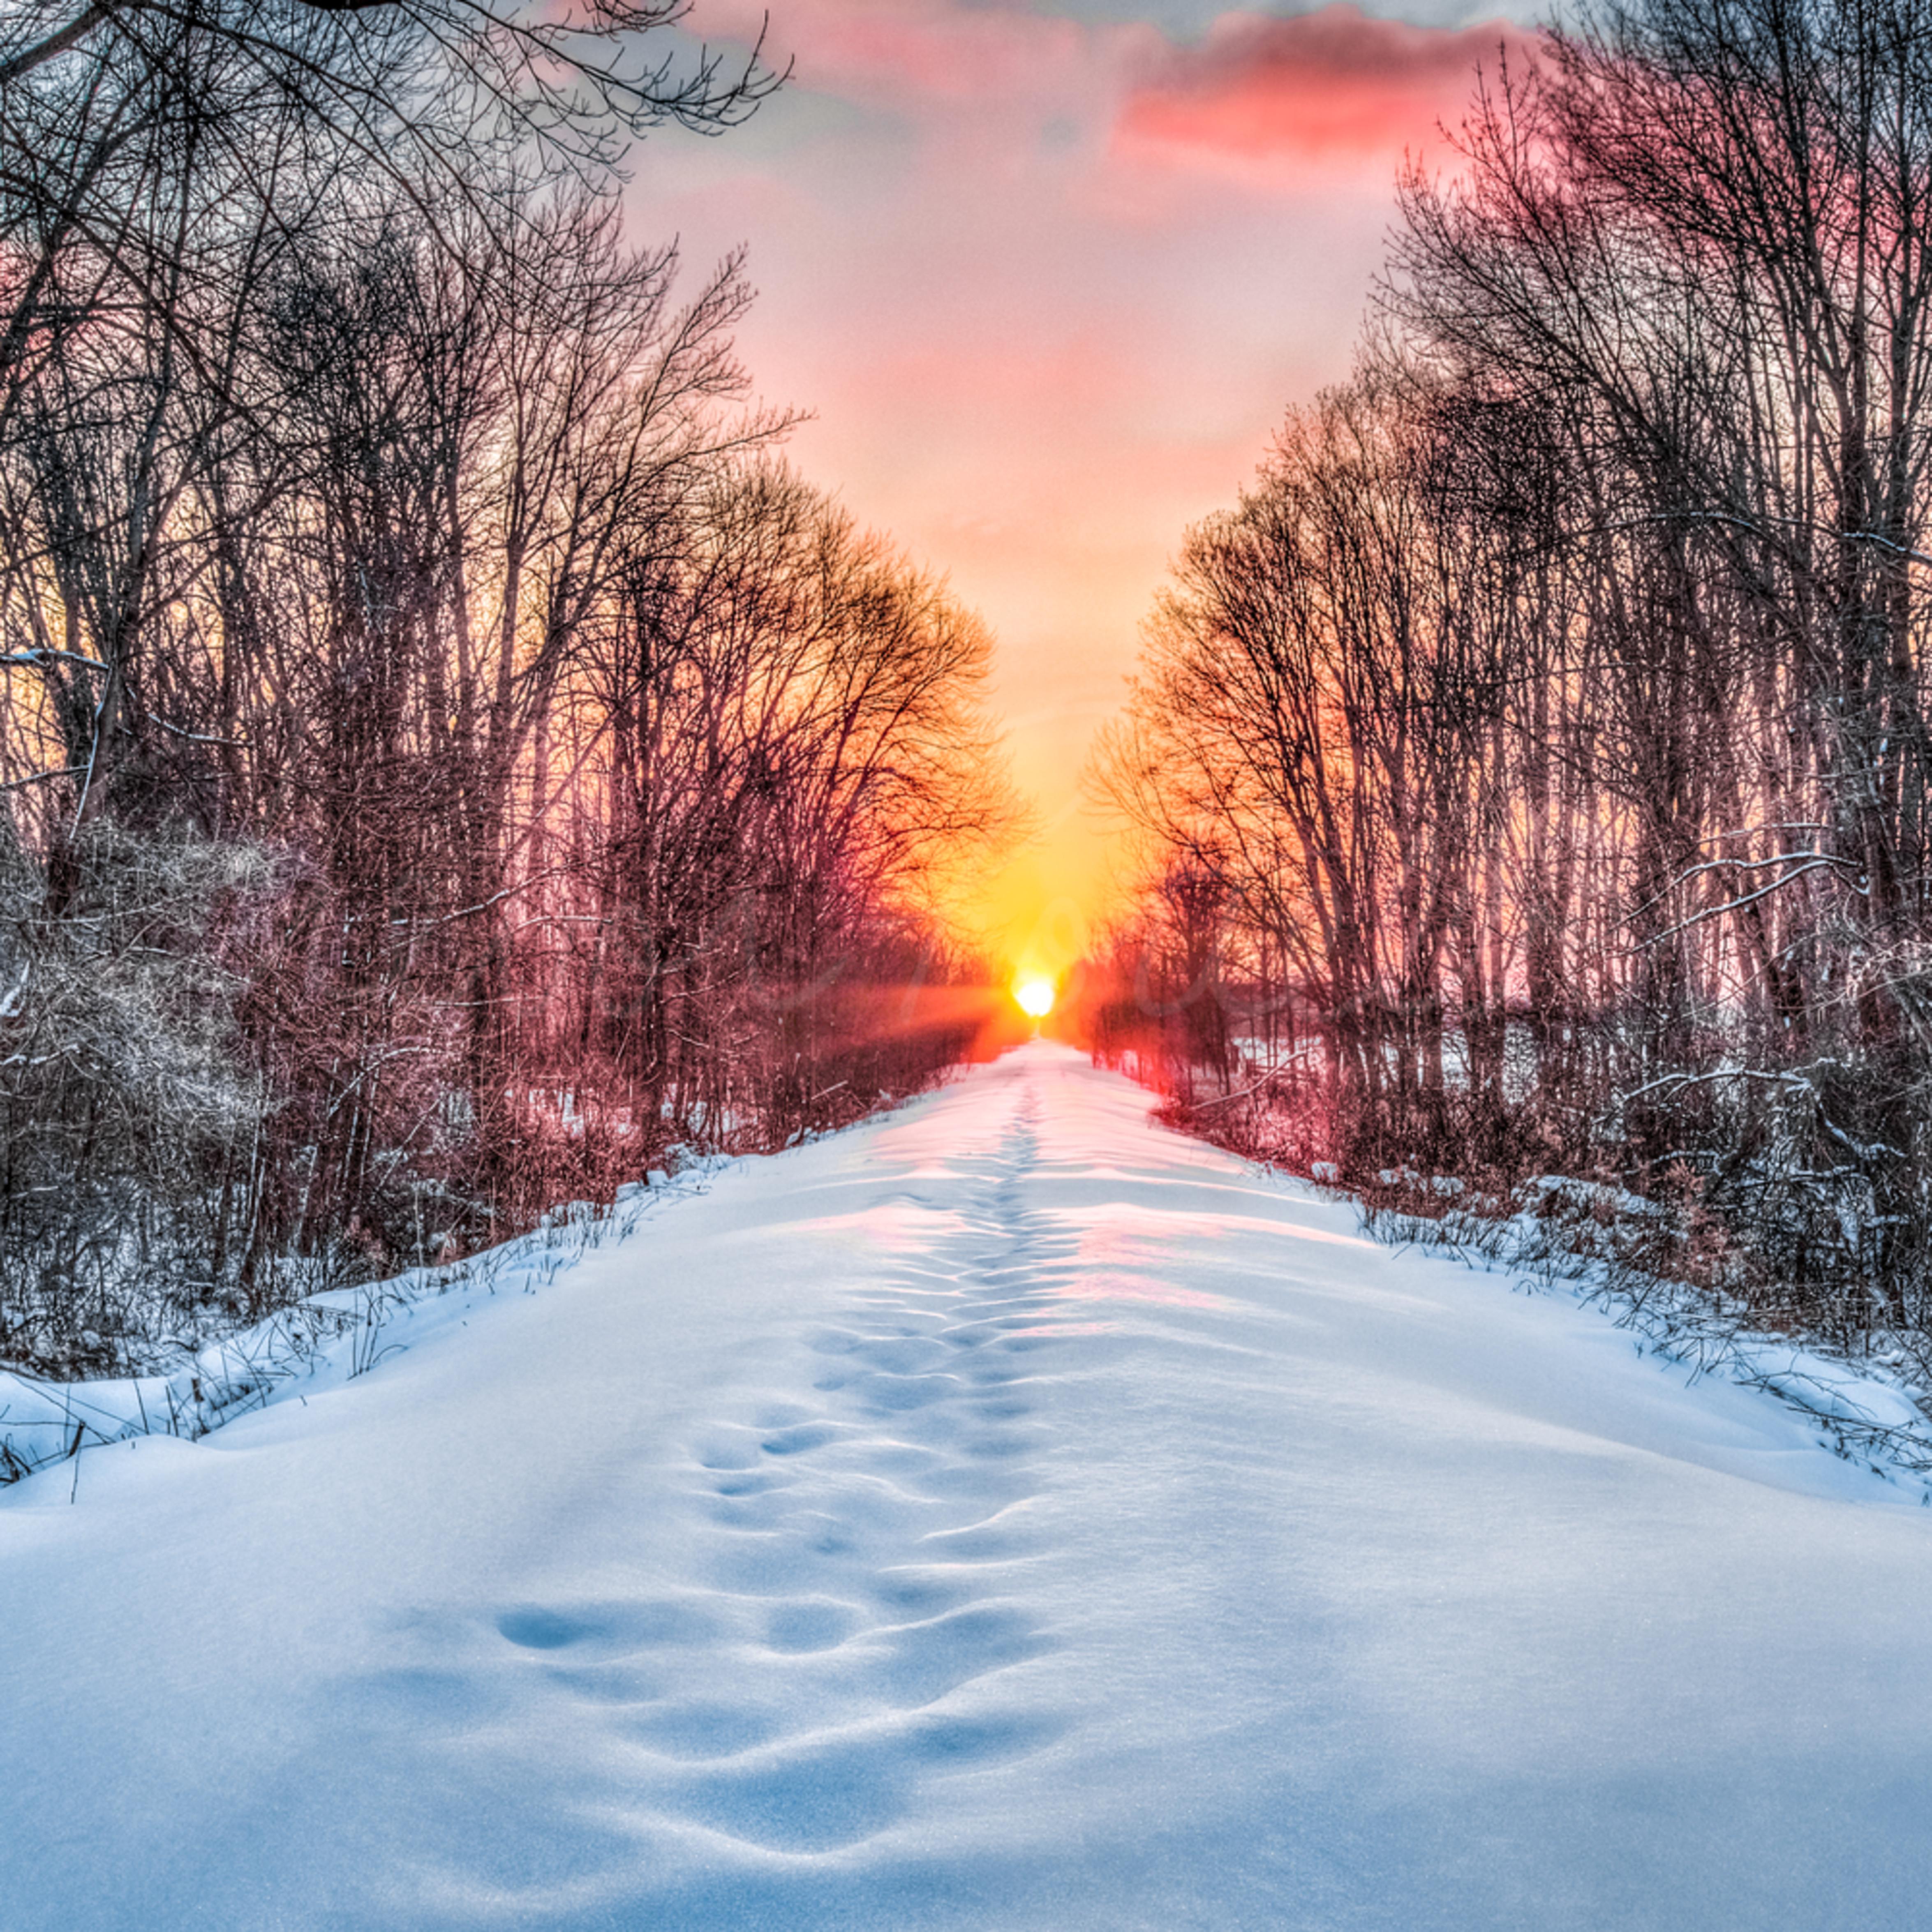 Pathway to the sun reathk